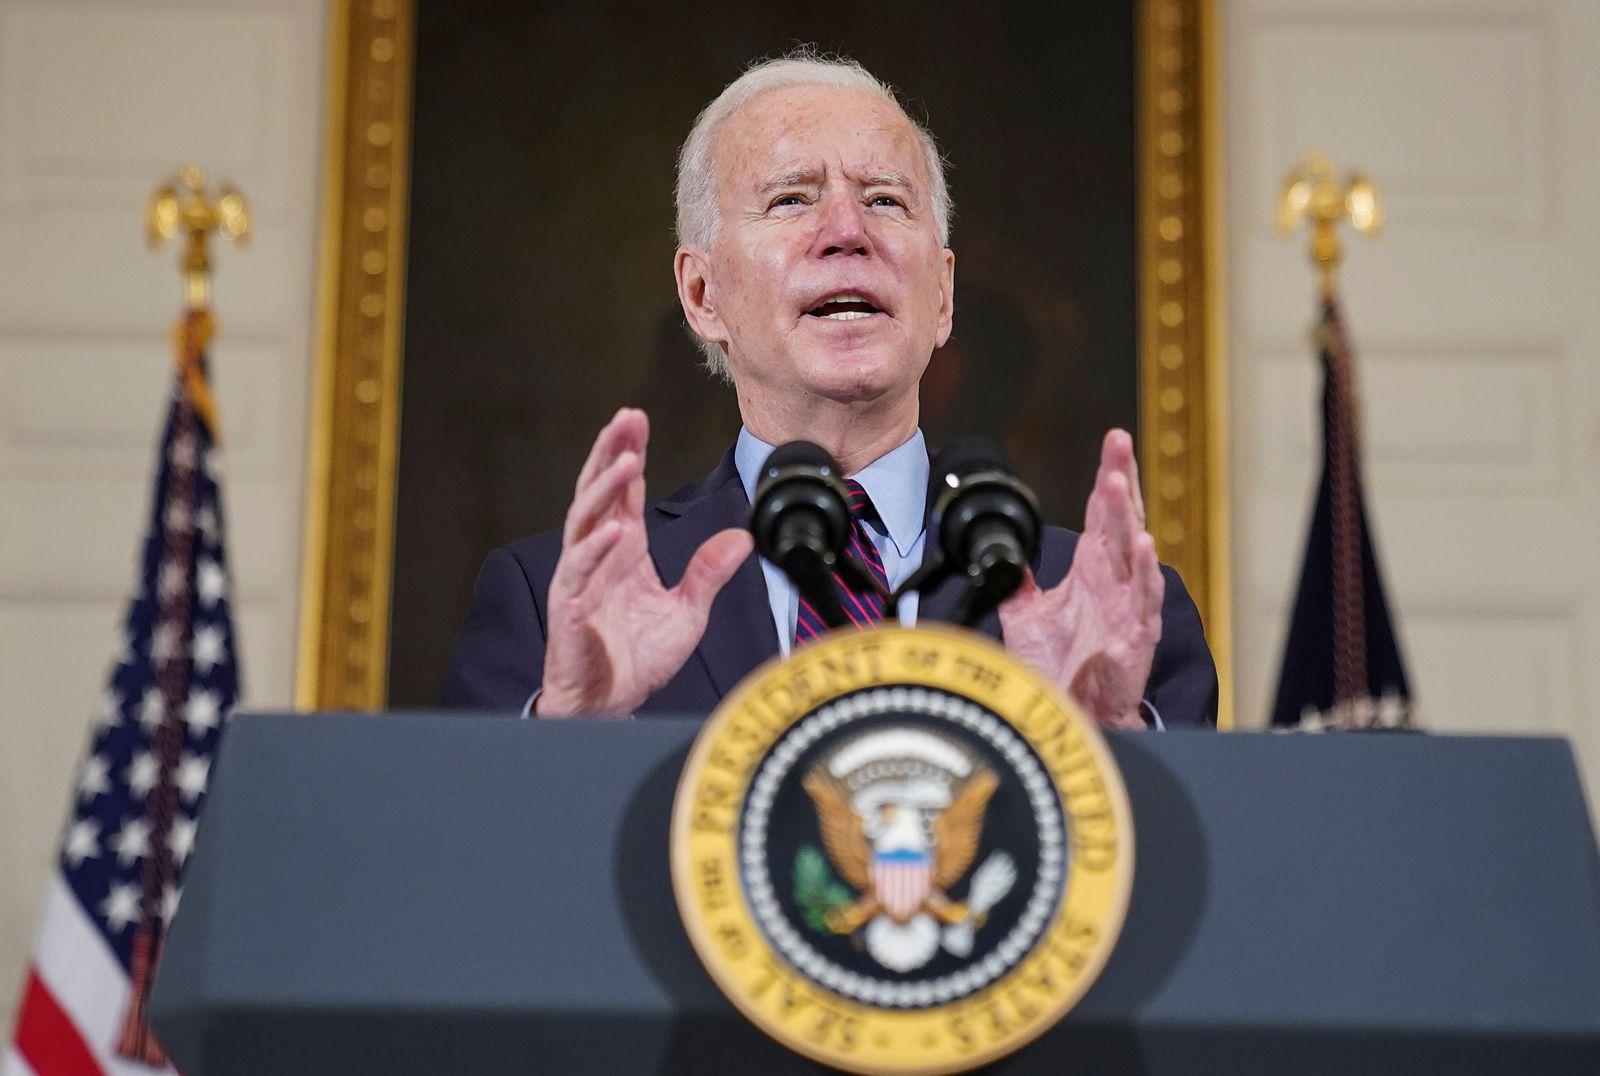 FILE PHOTO: U.S. President Biden speaks about the economy and need to pass coronavirus aid legislation at the White House in Washington